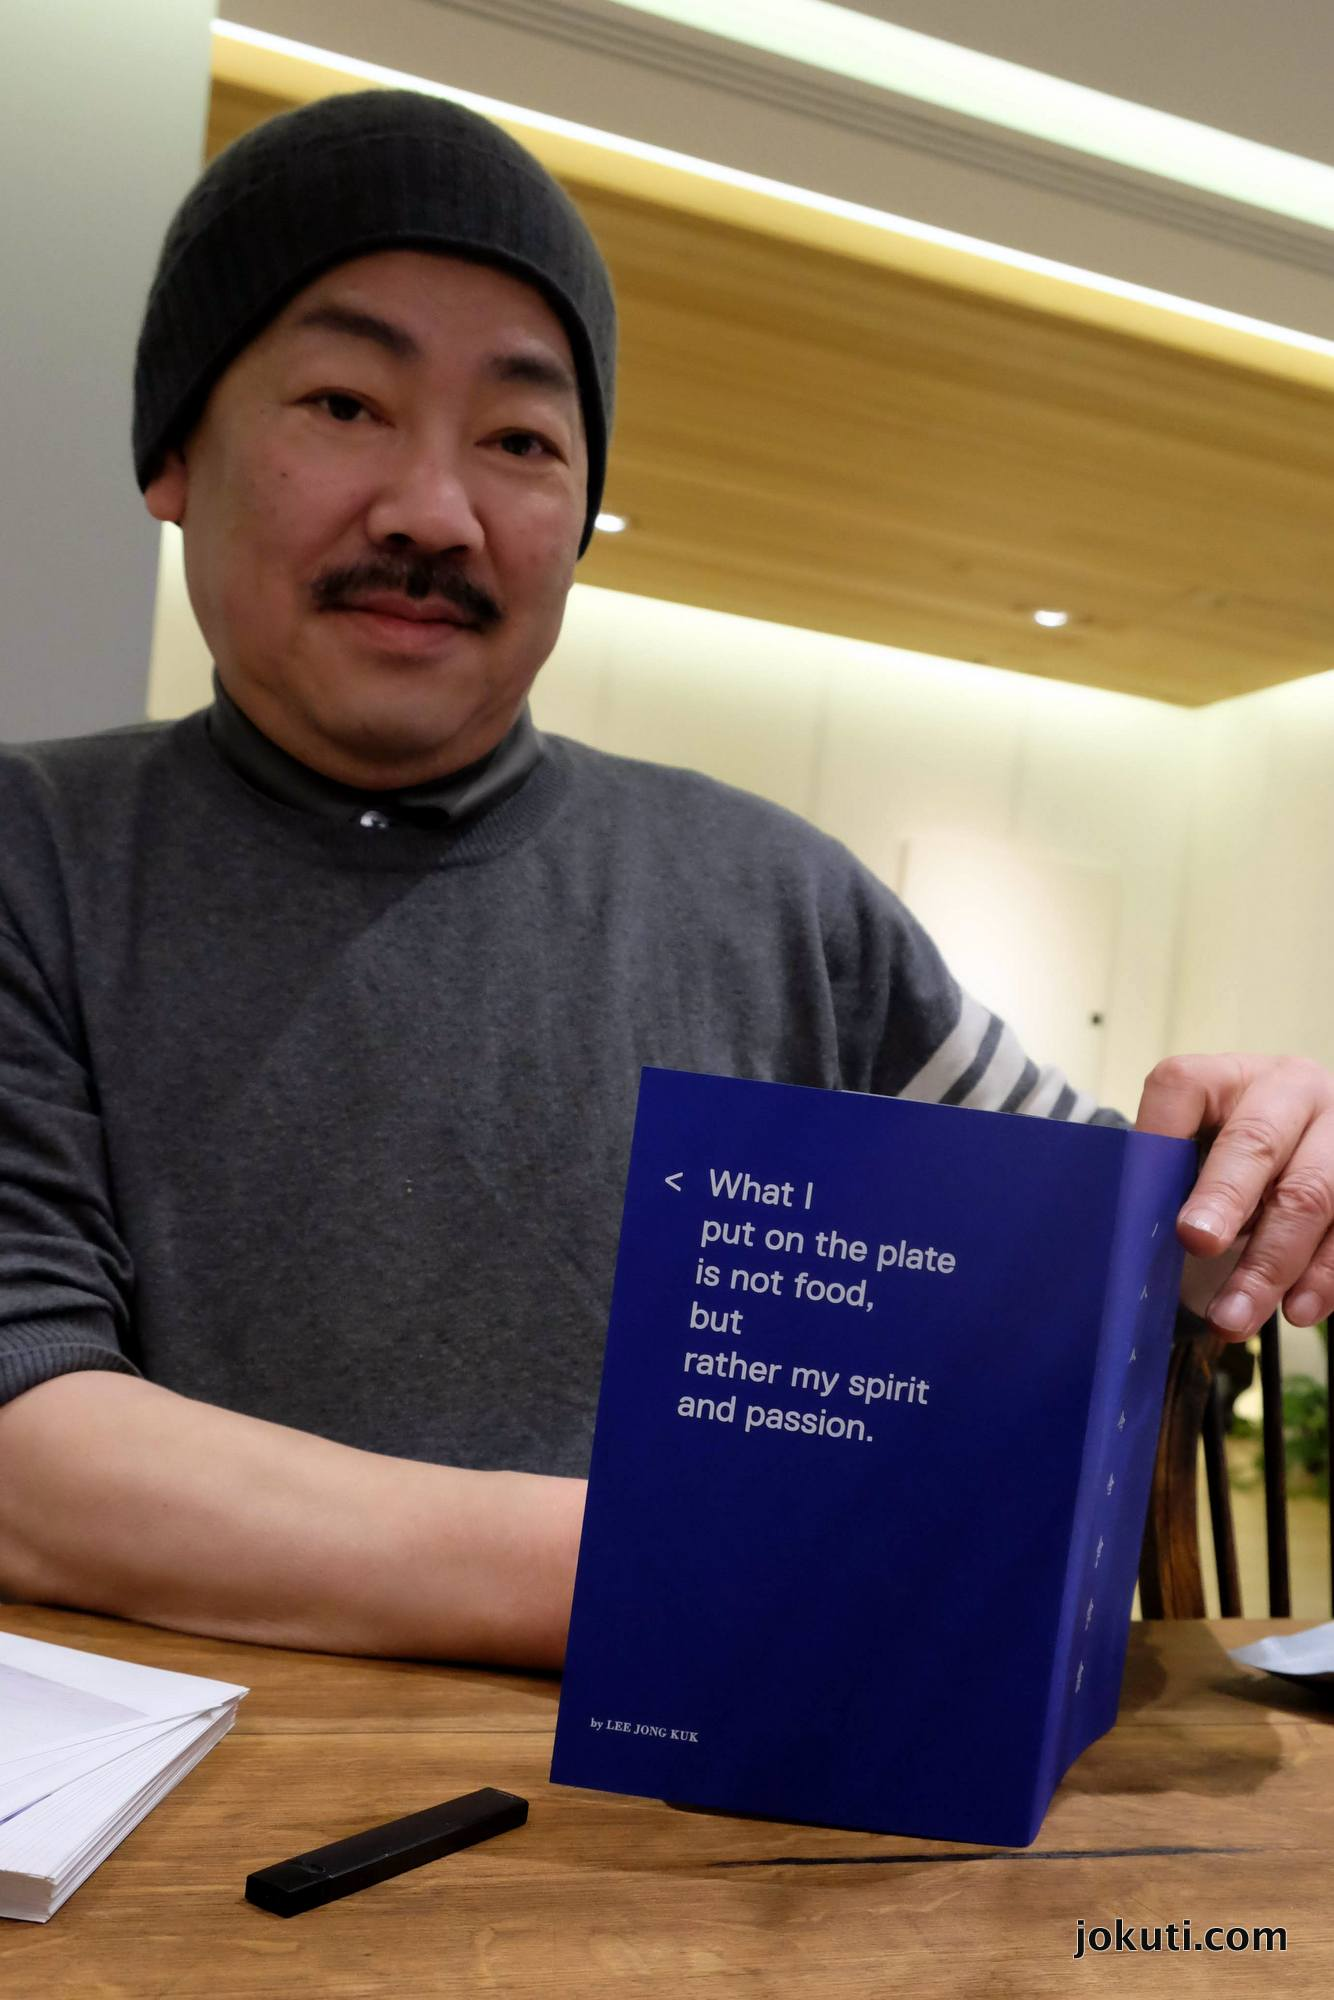 dscf9240_korea_seoul_chef_michelin_lee_jong_kuk_vilagevo_jokuti_andras.jpg